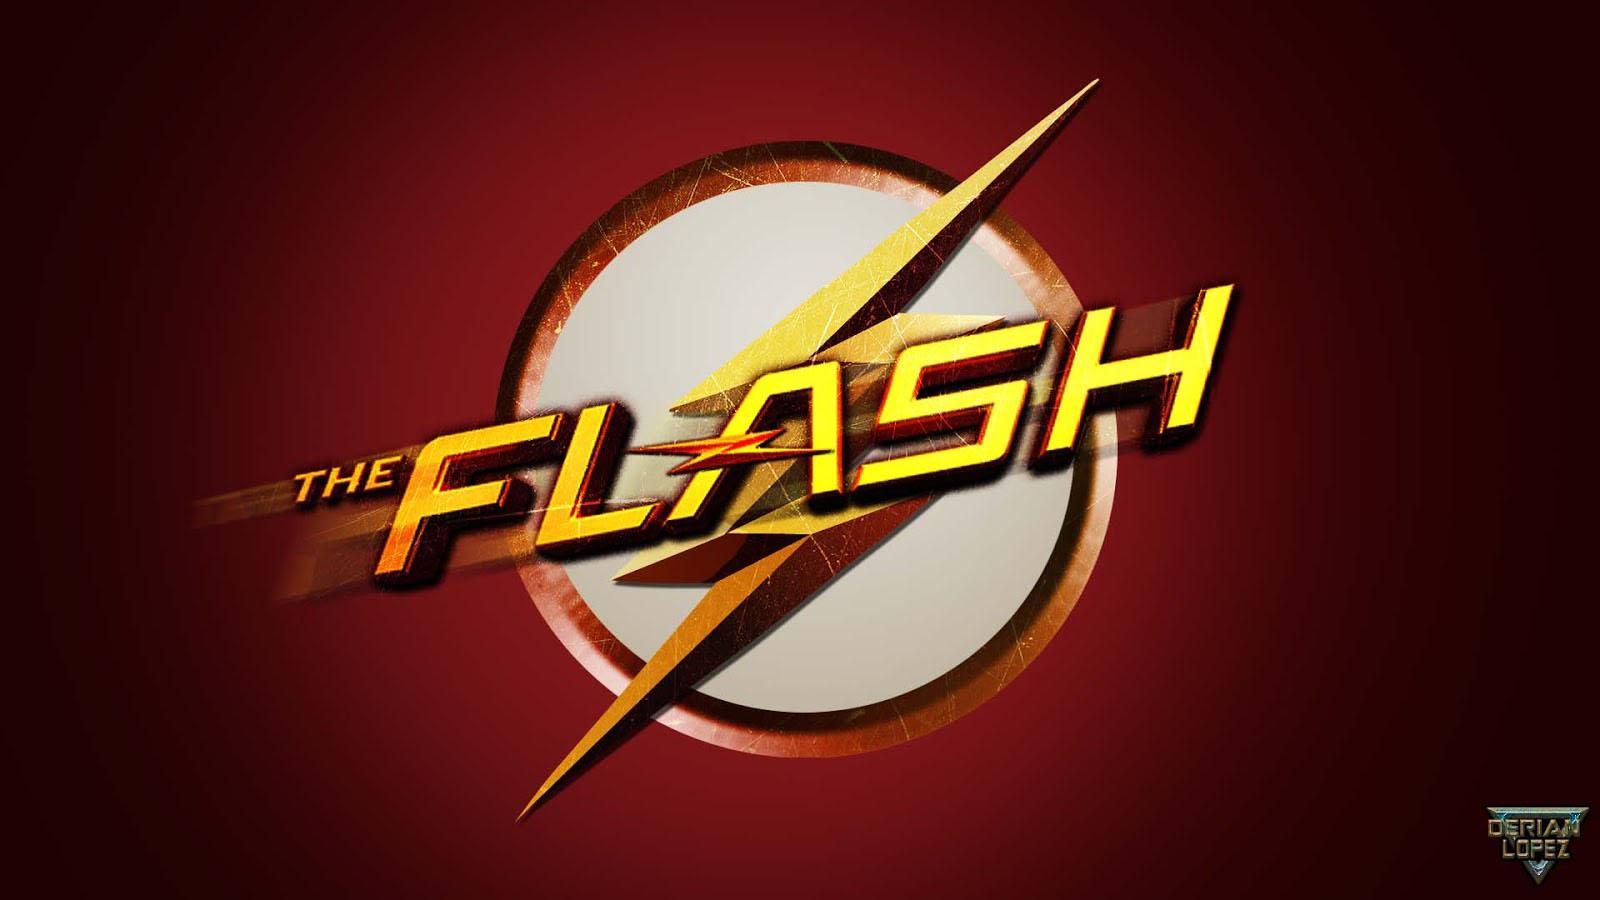 The Flash logo wallpaper 1600x900